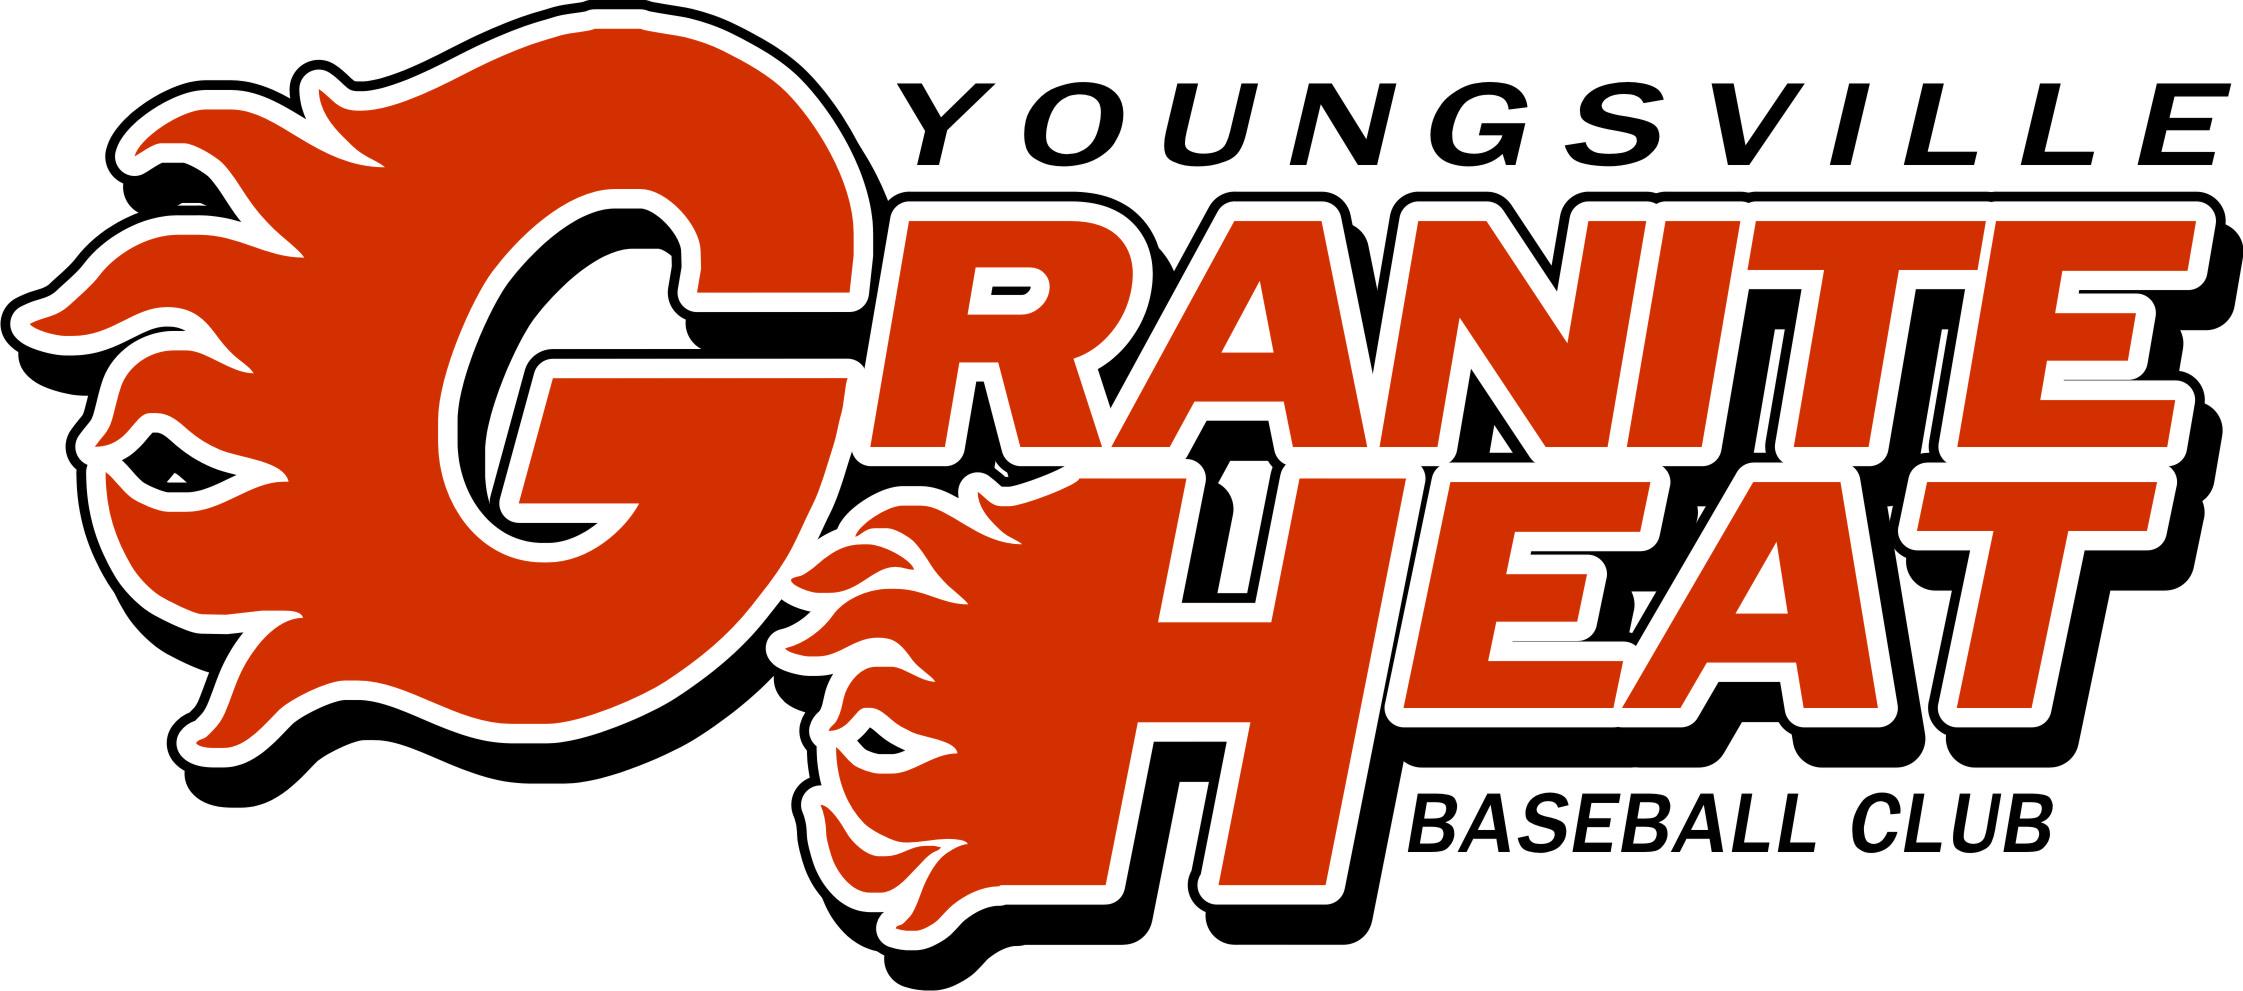 Youngsville Granite Heat Baseball Club